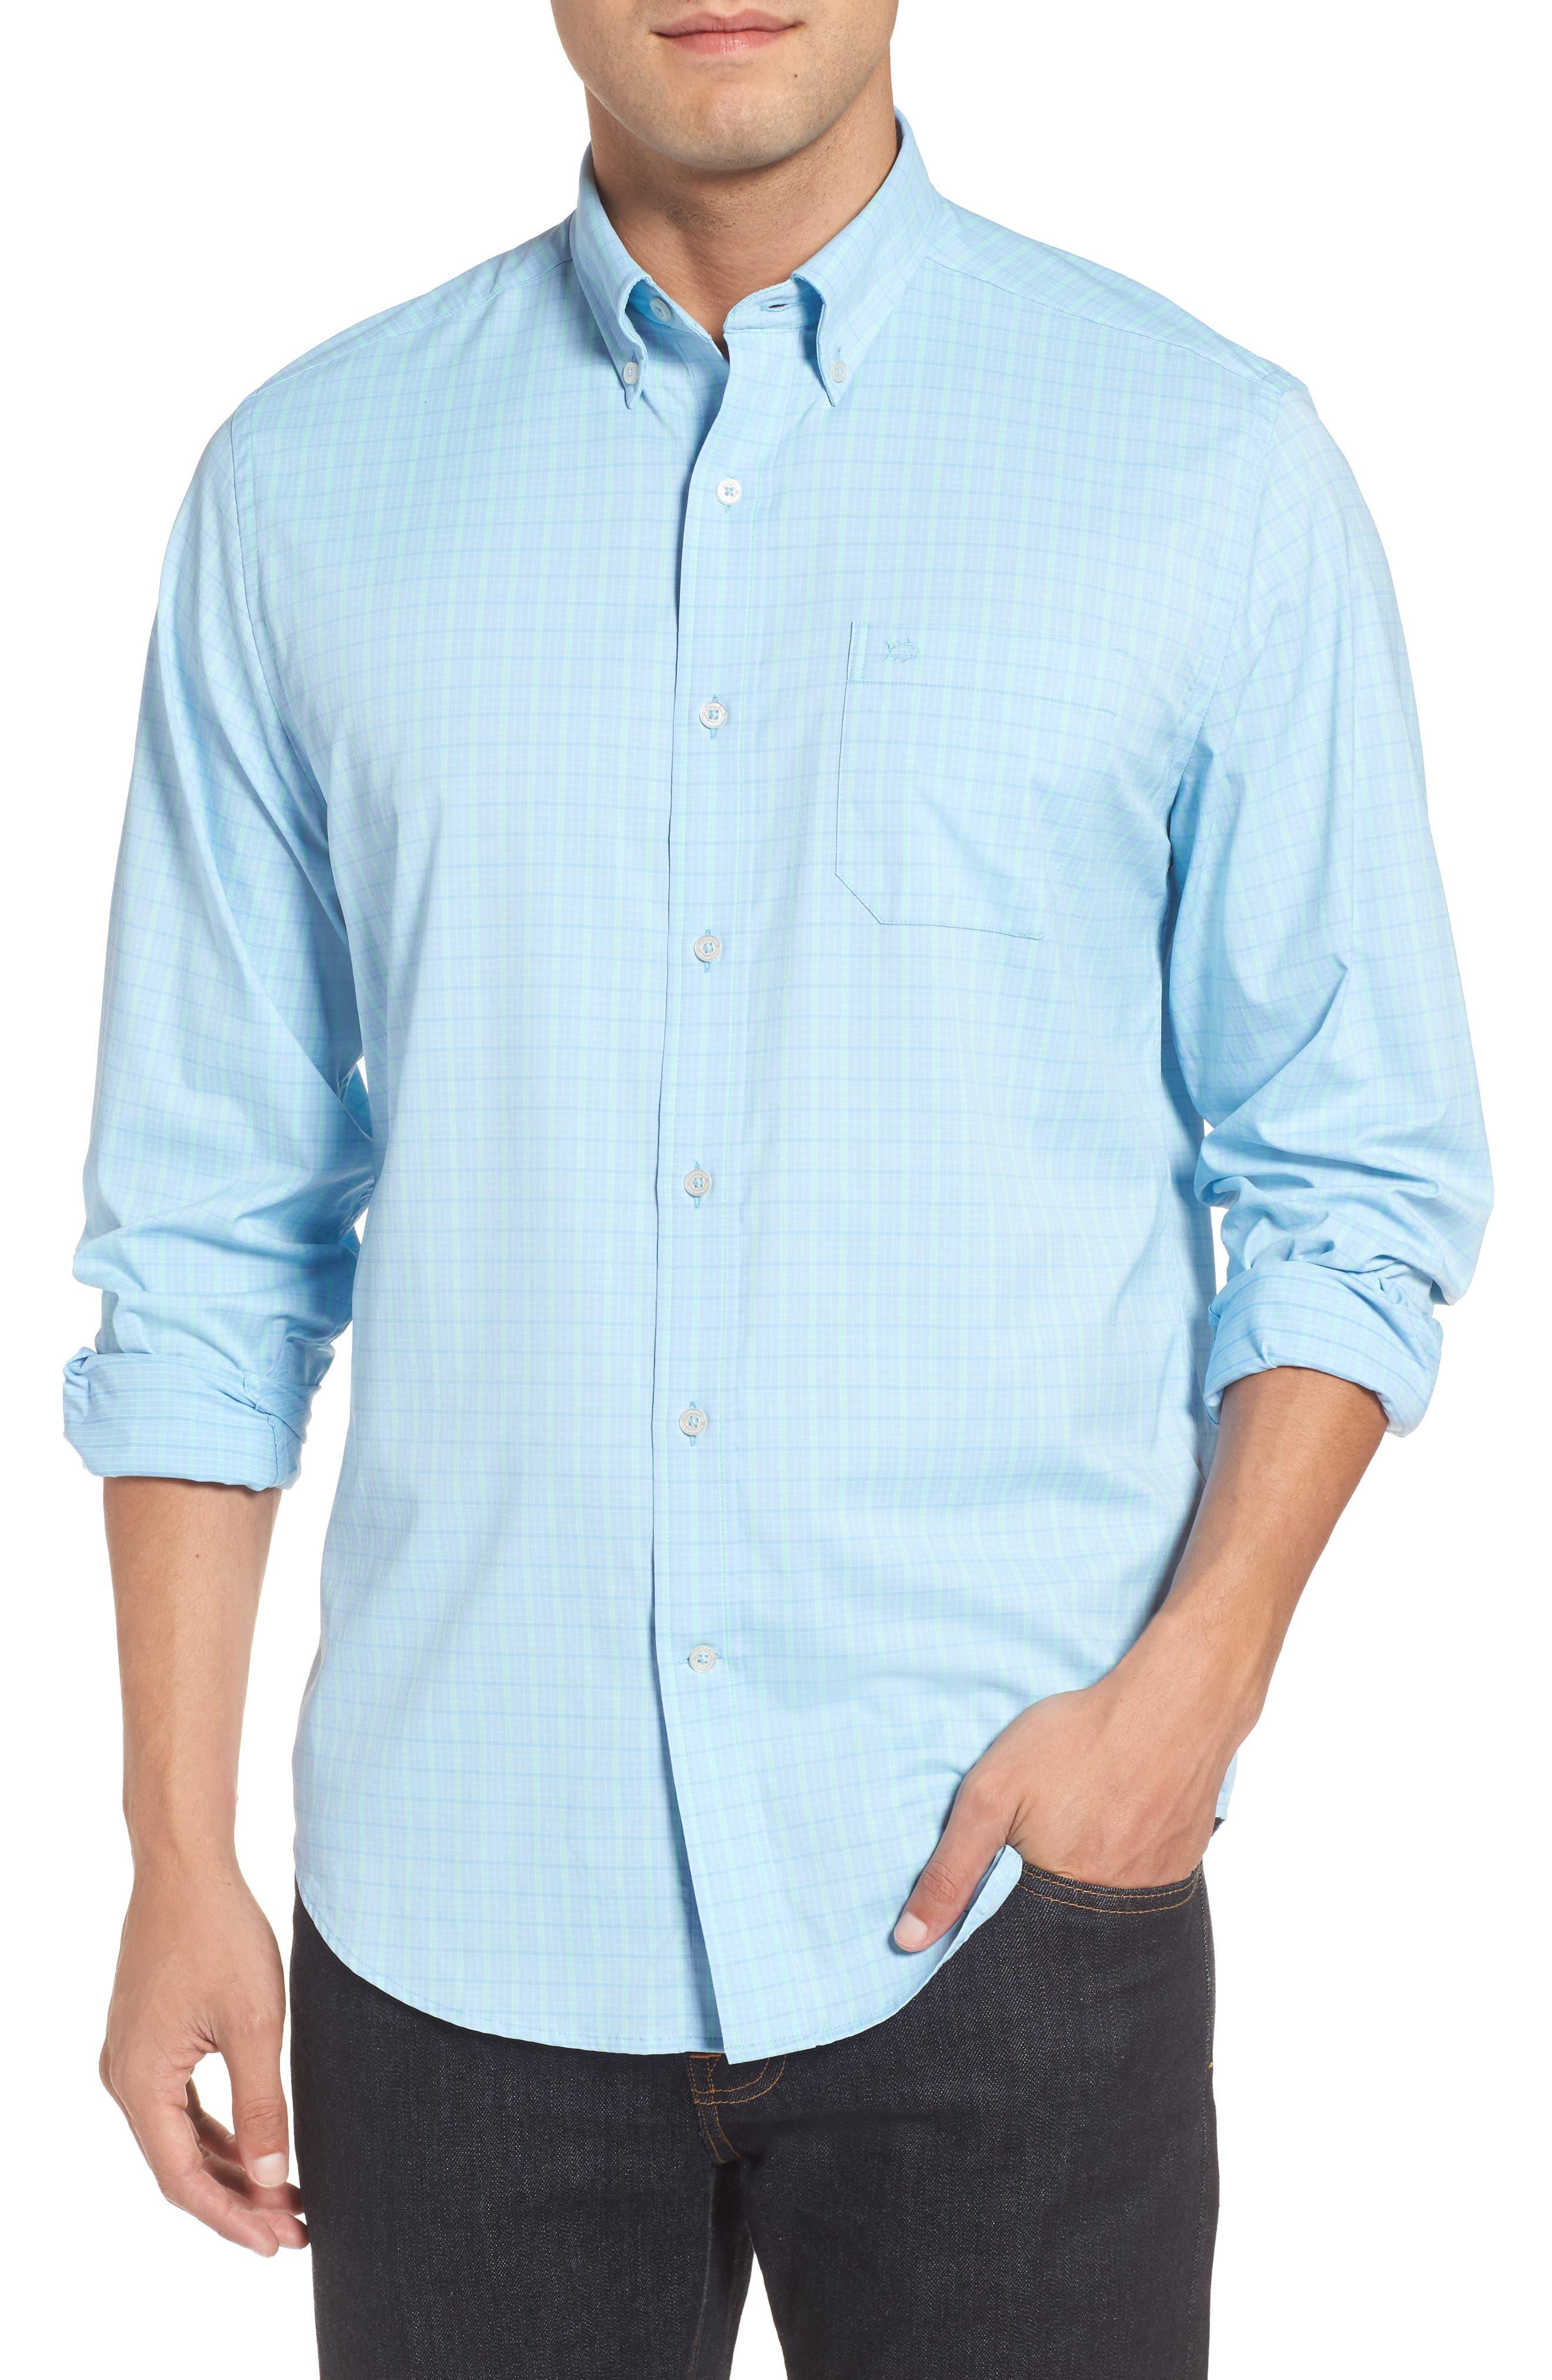 Intercoastal Gordia Plaid Sport Shirt,                             Main thumbnail 1, color,                             Sky Blue